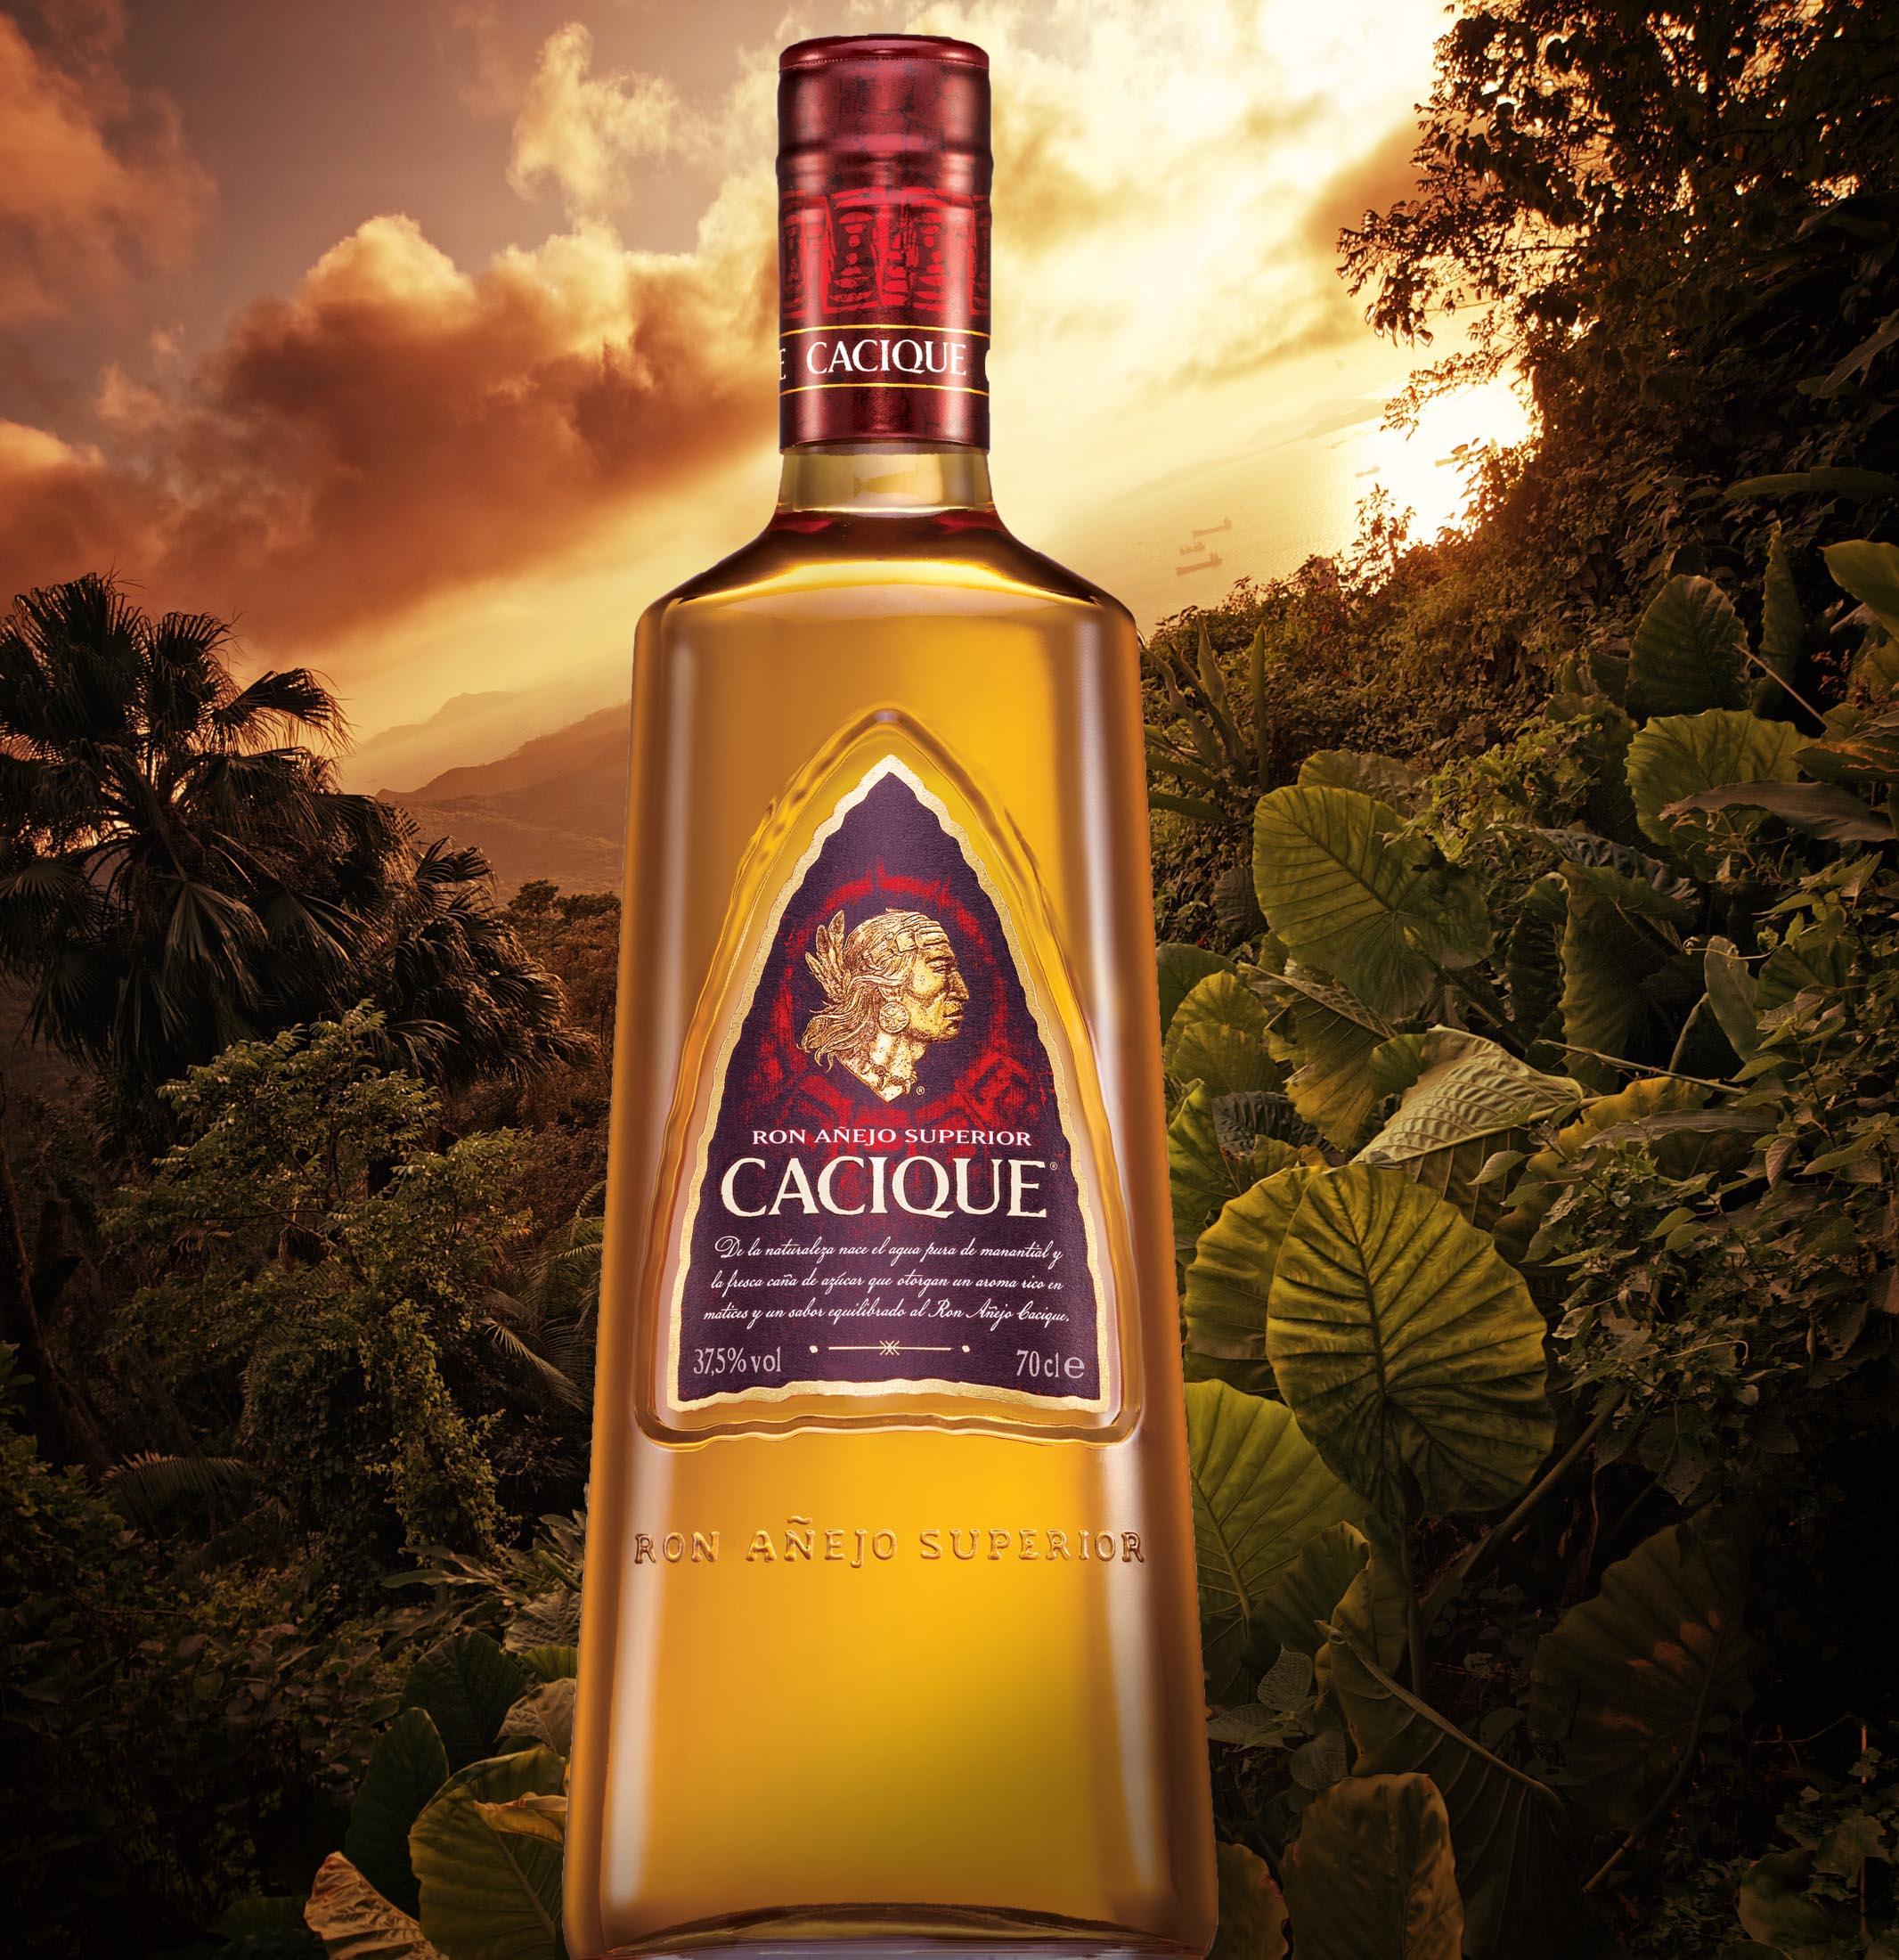 Cacique Bottle in Jungle1.jpg